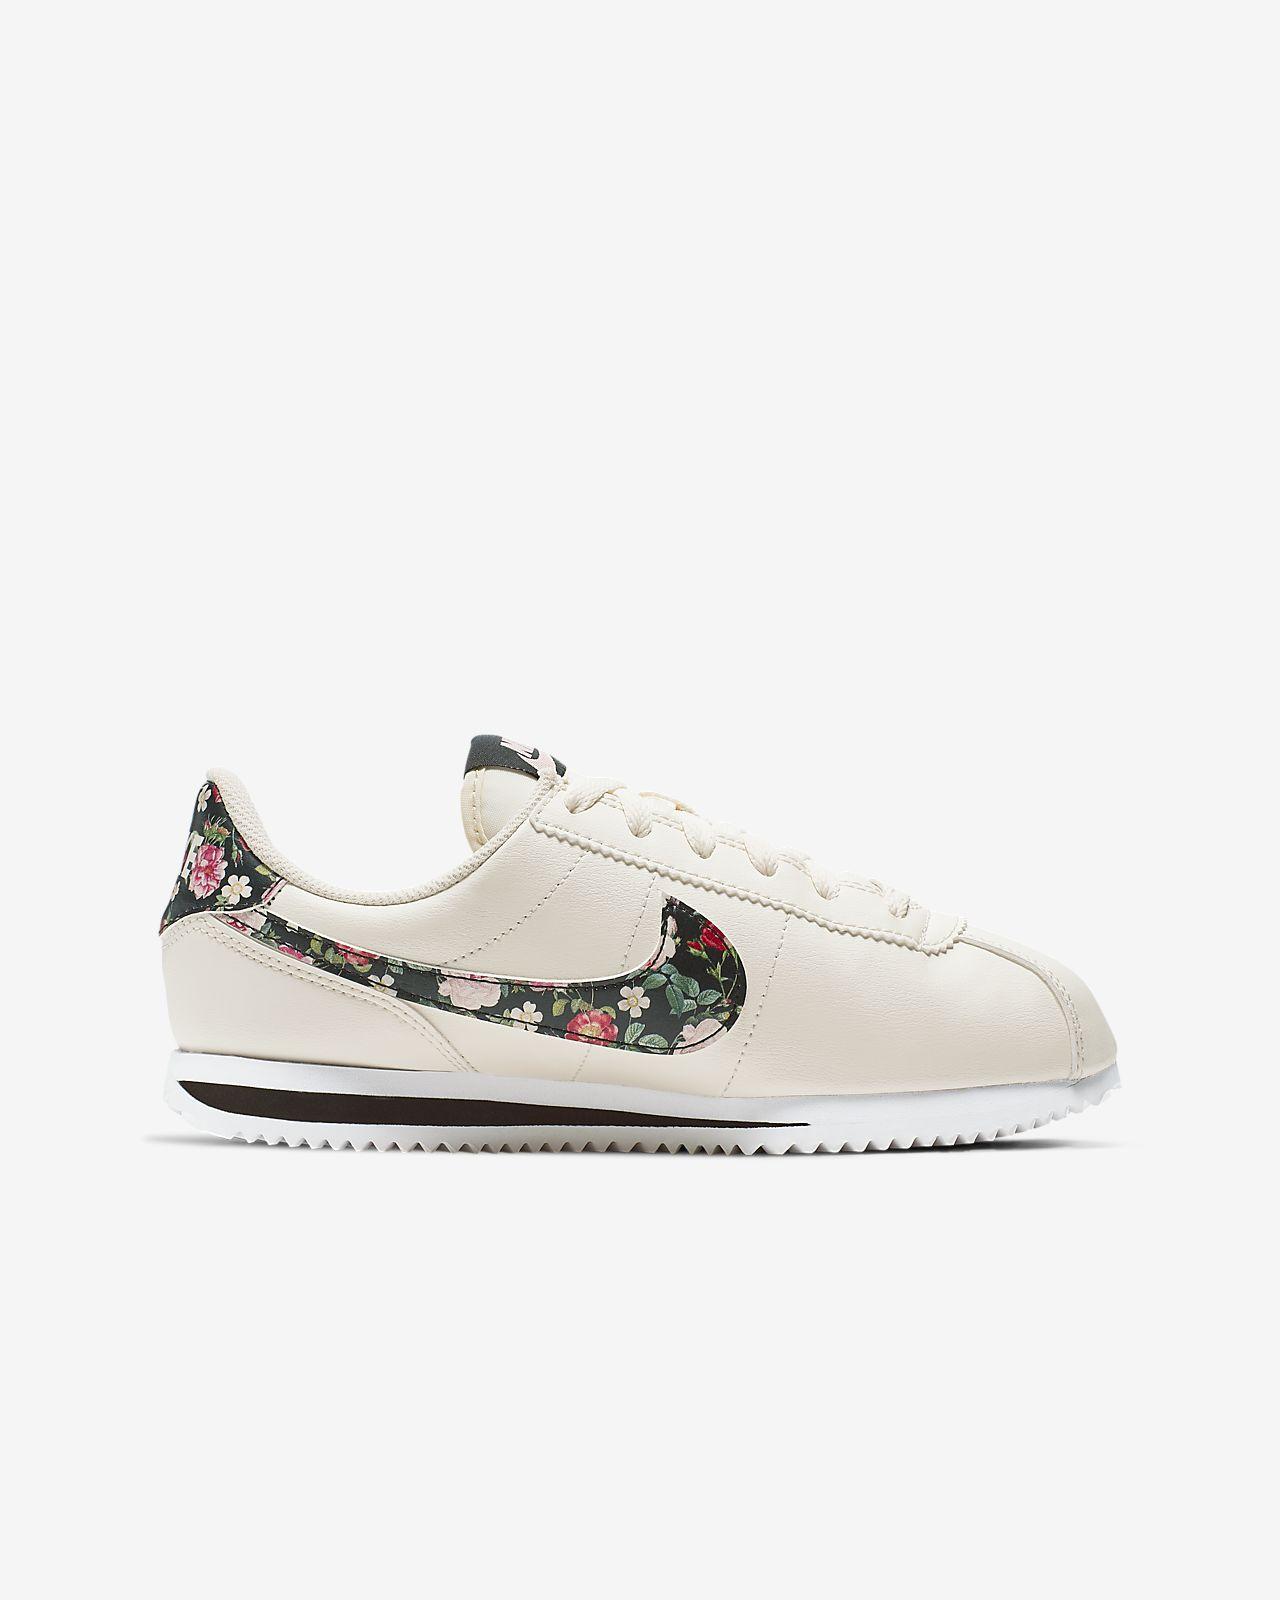 Ältere Für Schuh Cortez Vintage Kinder Basic Nike Floral kPXiZOu